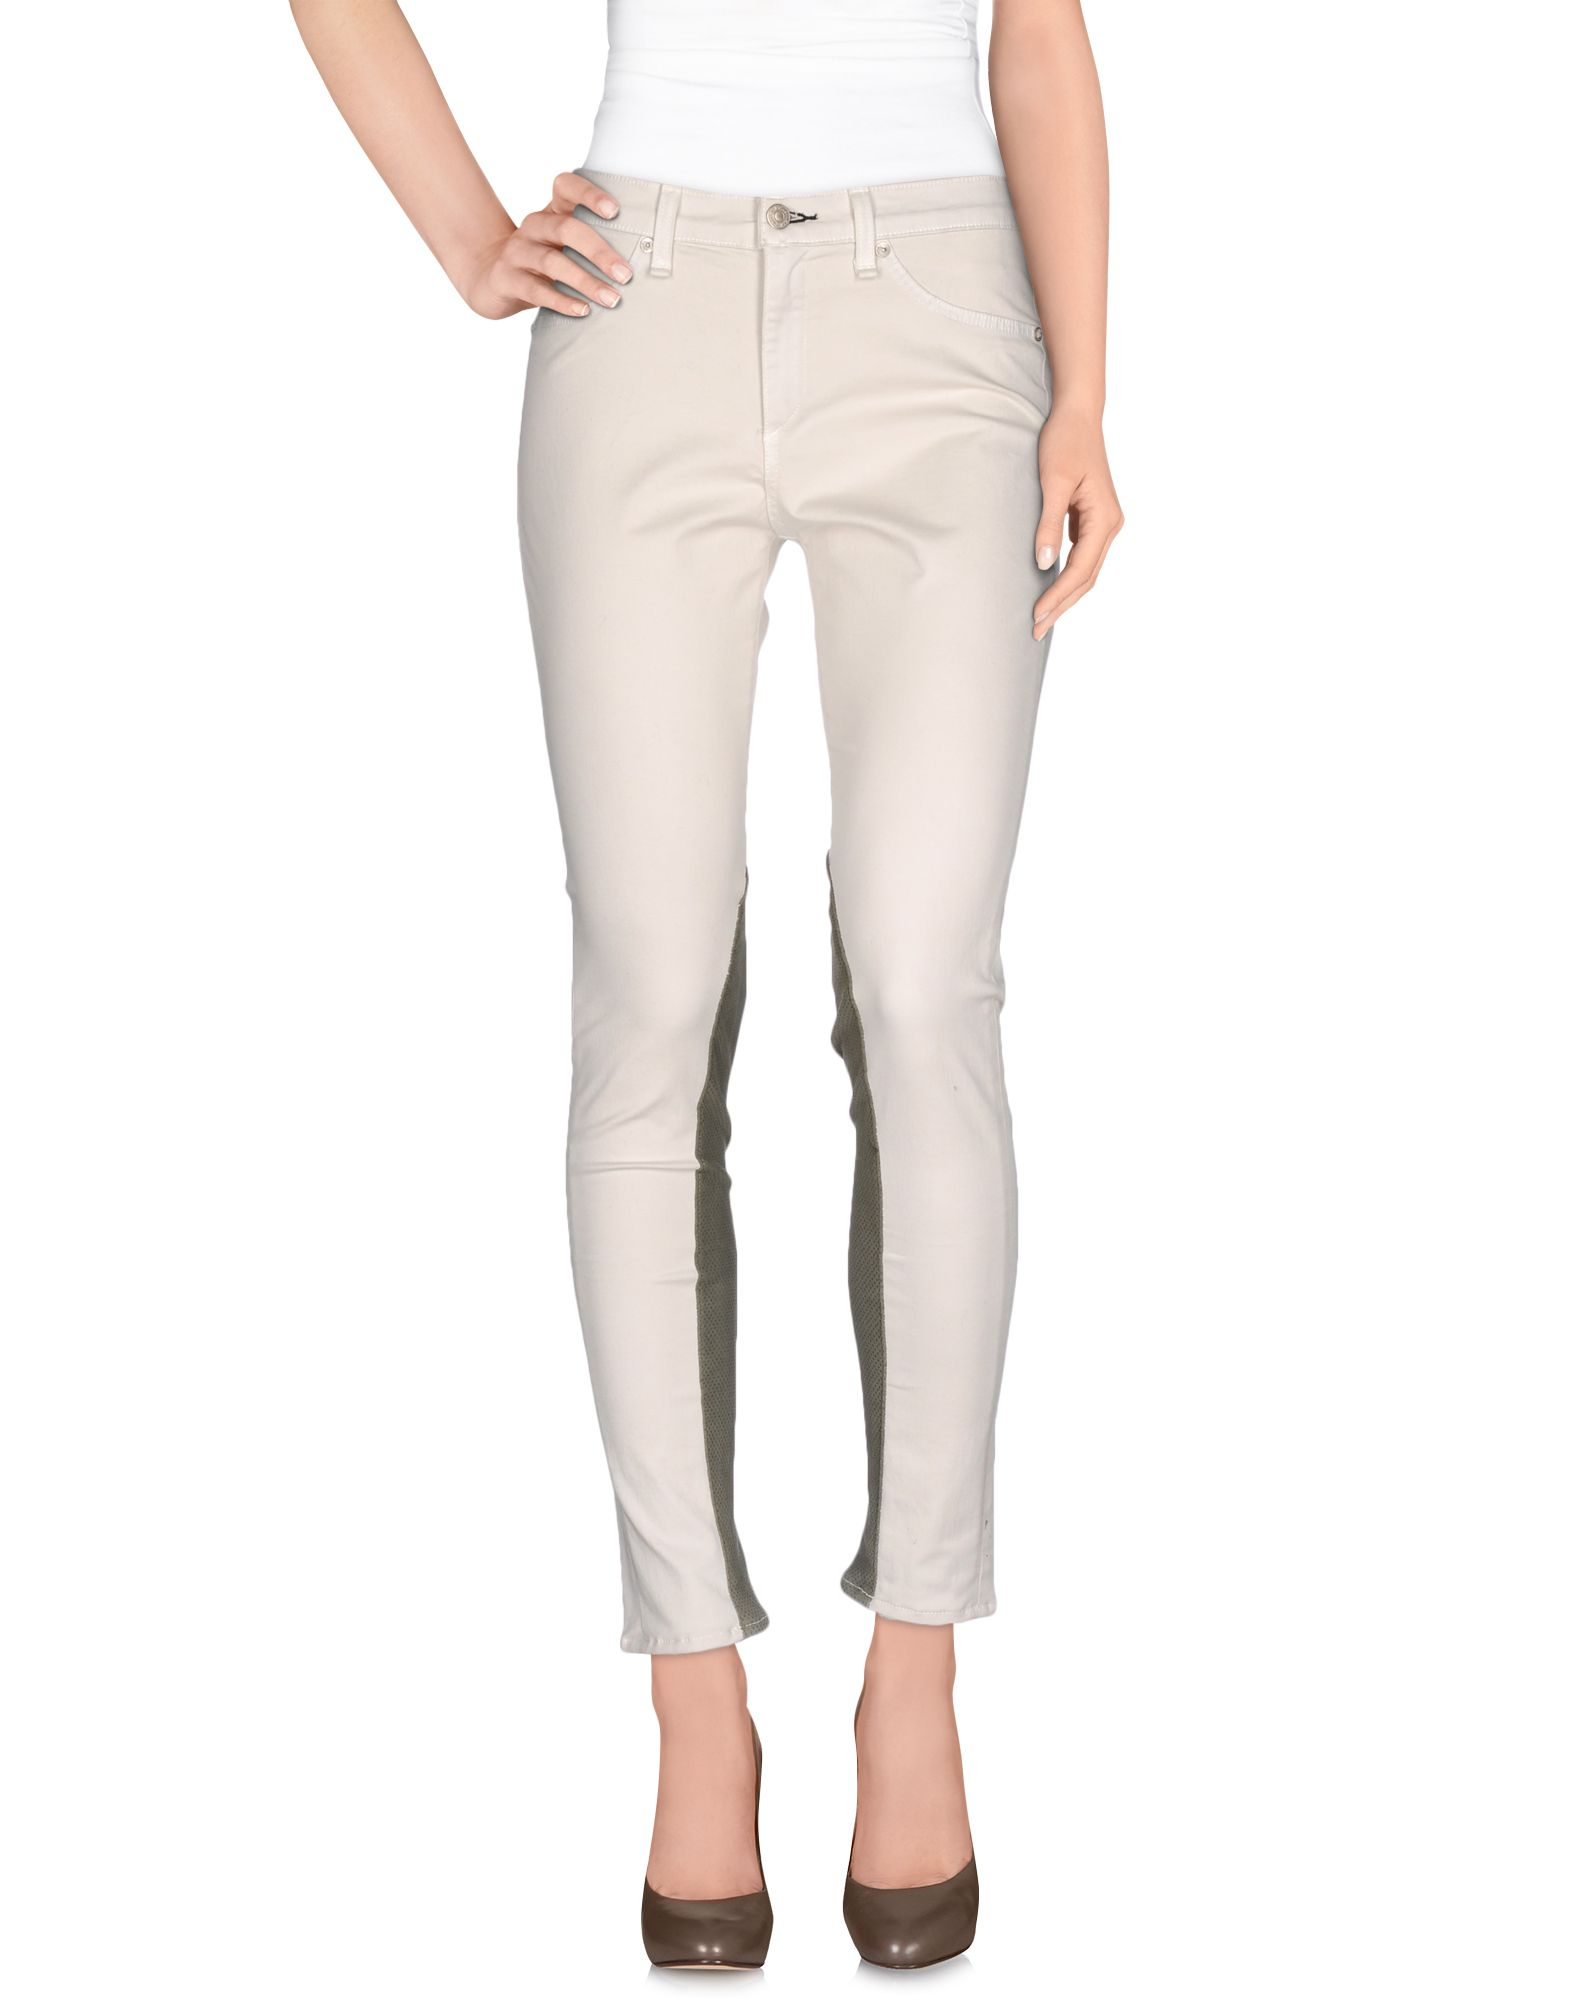 RAG & BONE/JEAN Повседневные брюки колготки молочного цвета catimini ут 00017629